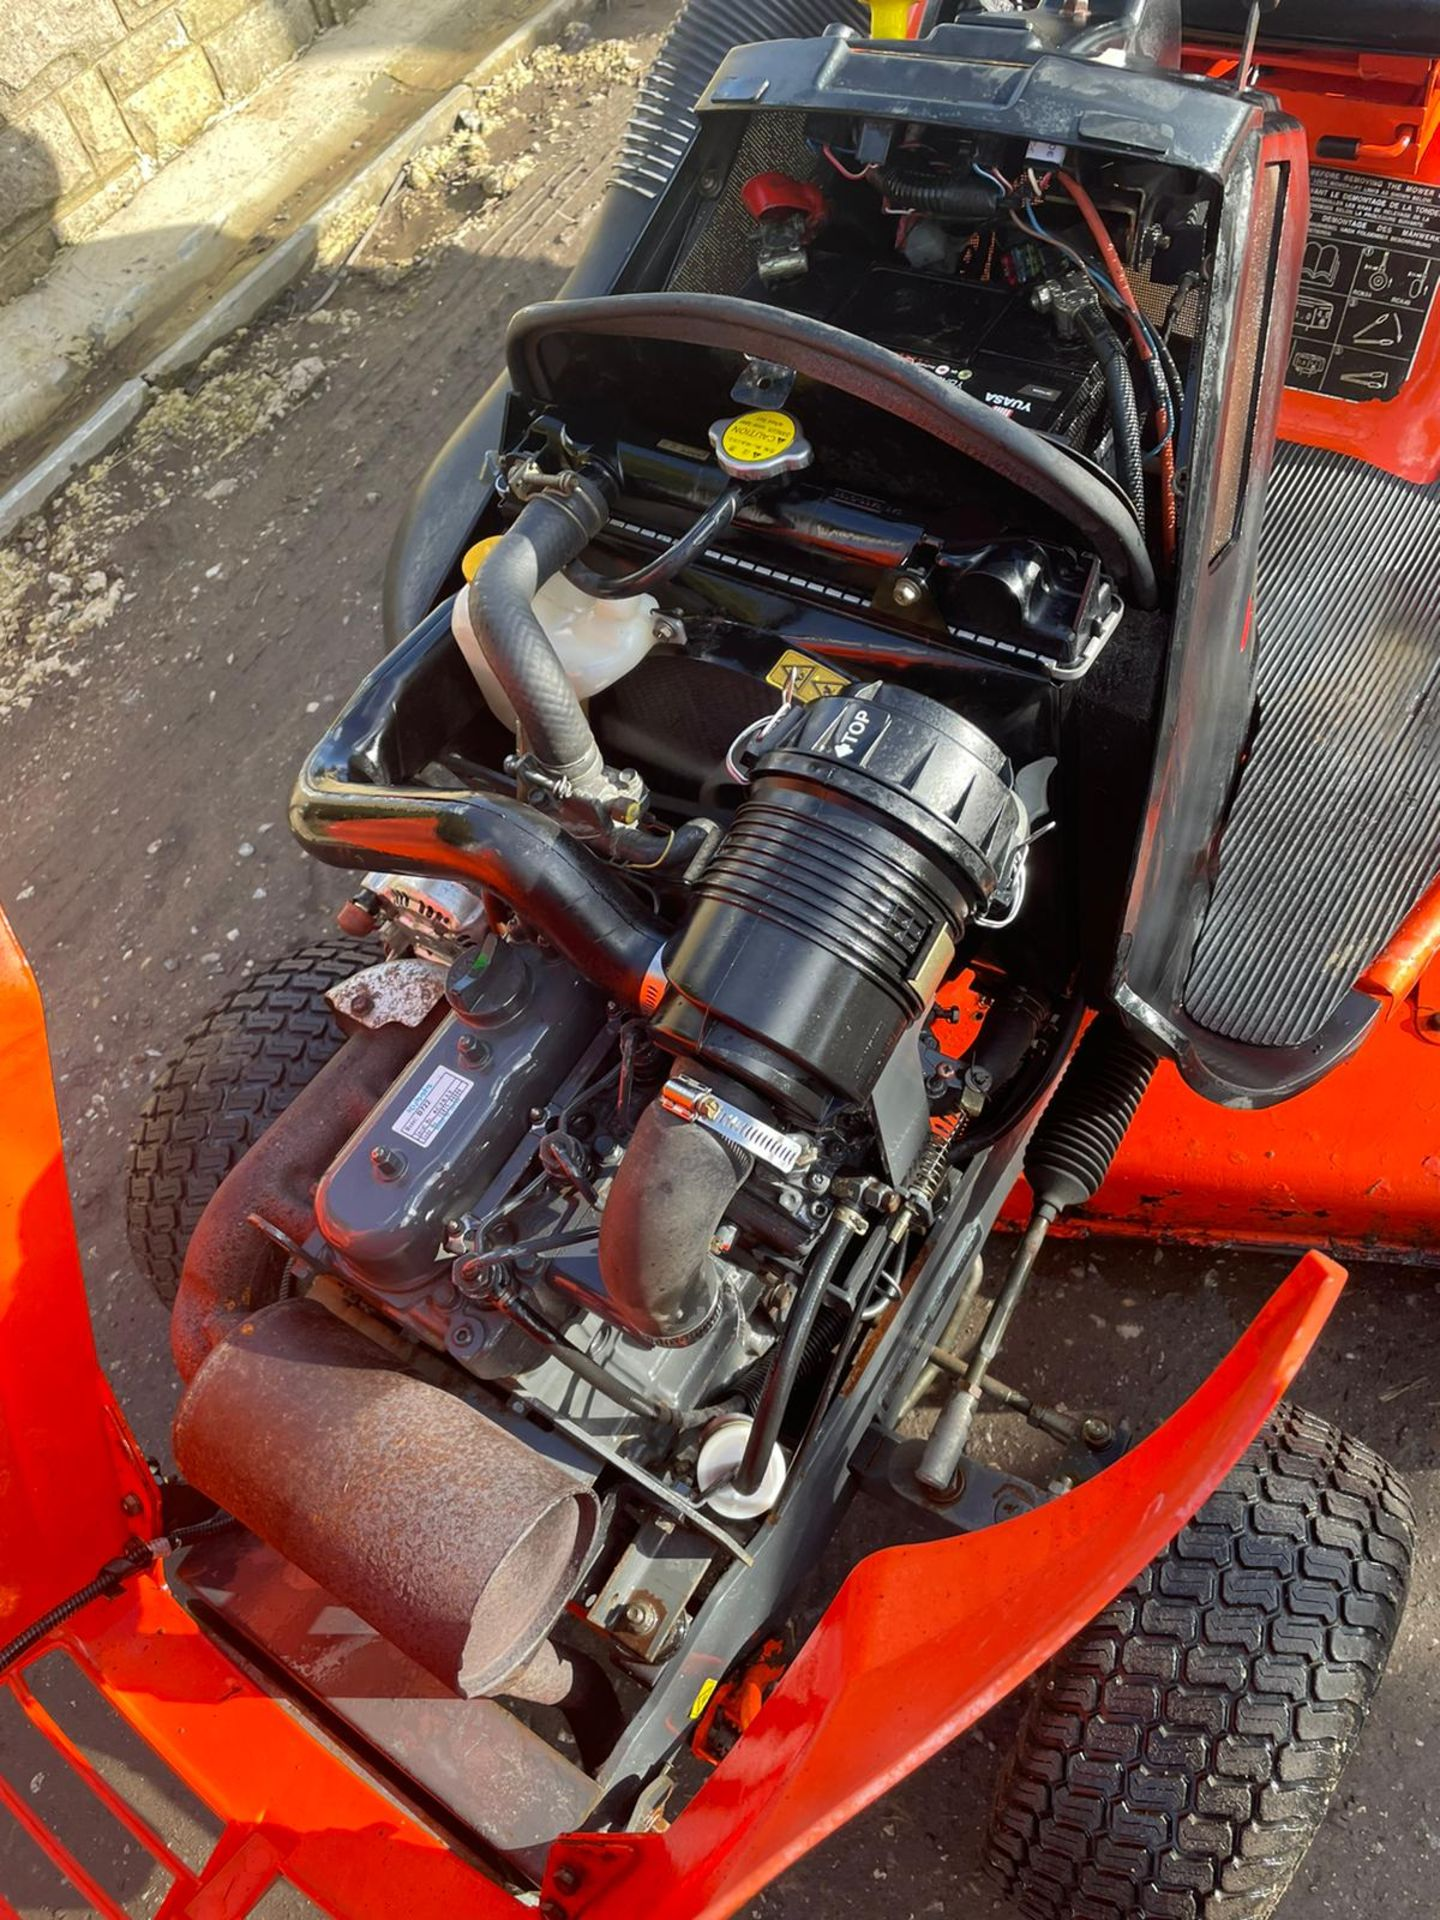 KUBOTA TG1860 RIDE ON LAWN MOWER, 3 CYLINDER KUBOTA DIESEL ENGINE, VERY LOW HOURS 1030 *NO VAT* - Image 3 of 7